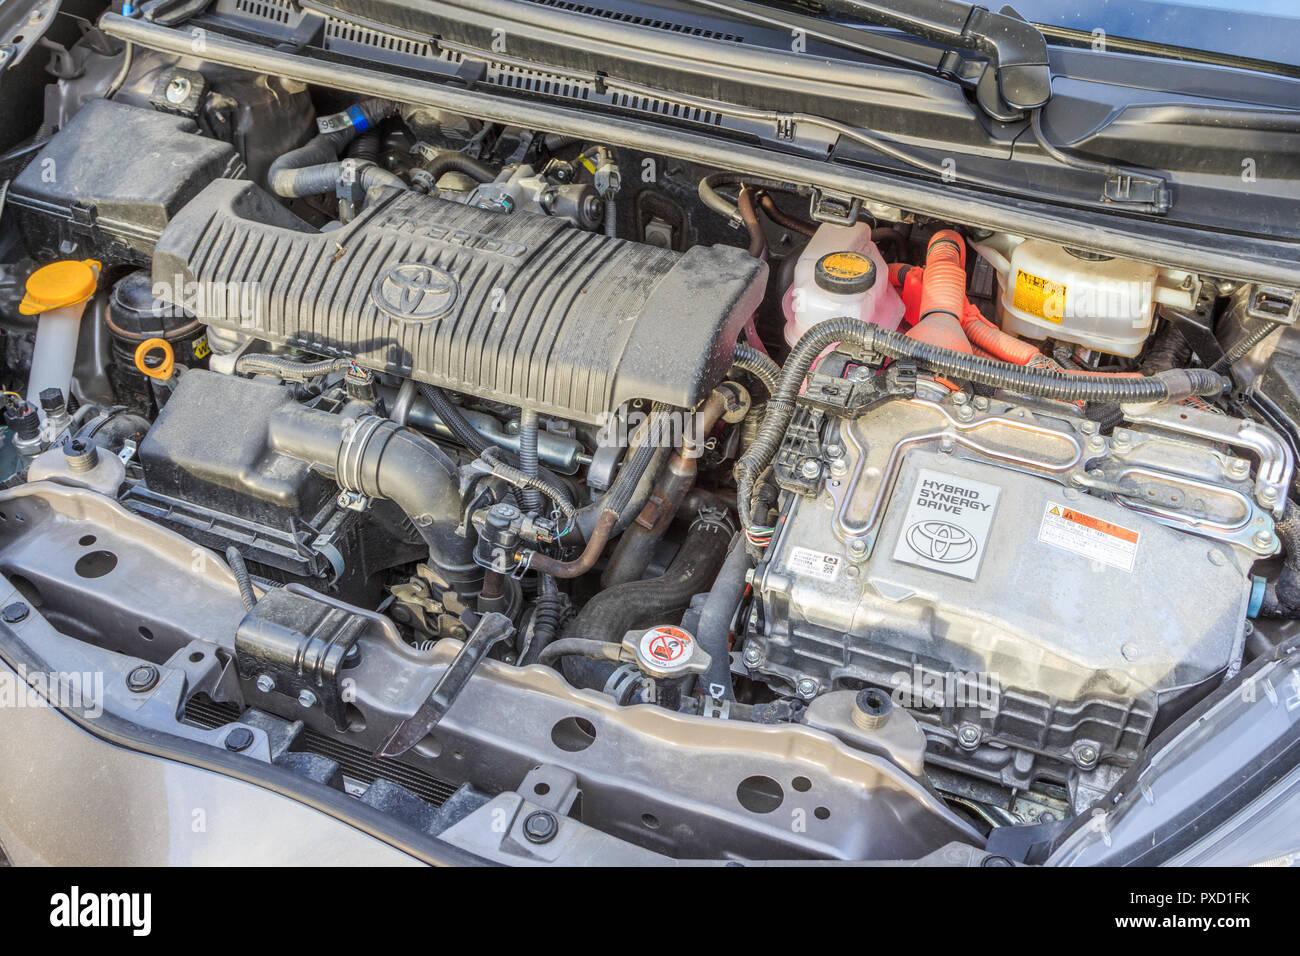 toyota yaris hybrid engine bay power plant Stock Photo